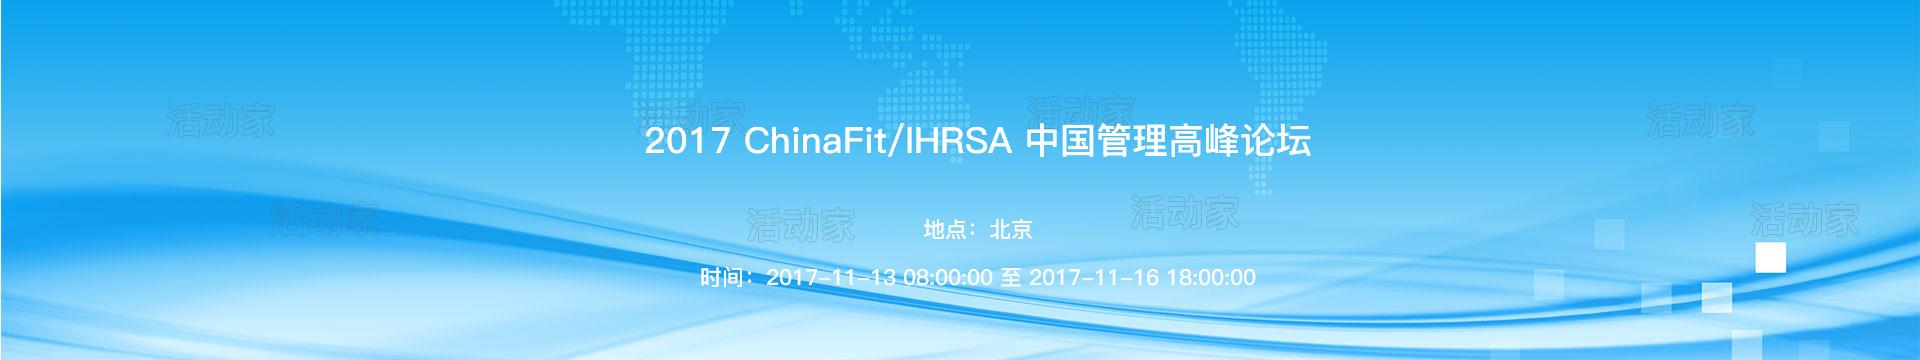 2017 ChinaFit/IHRSA 中国管理高峰论坛